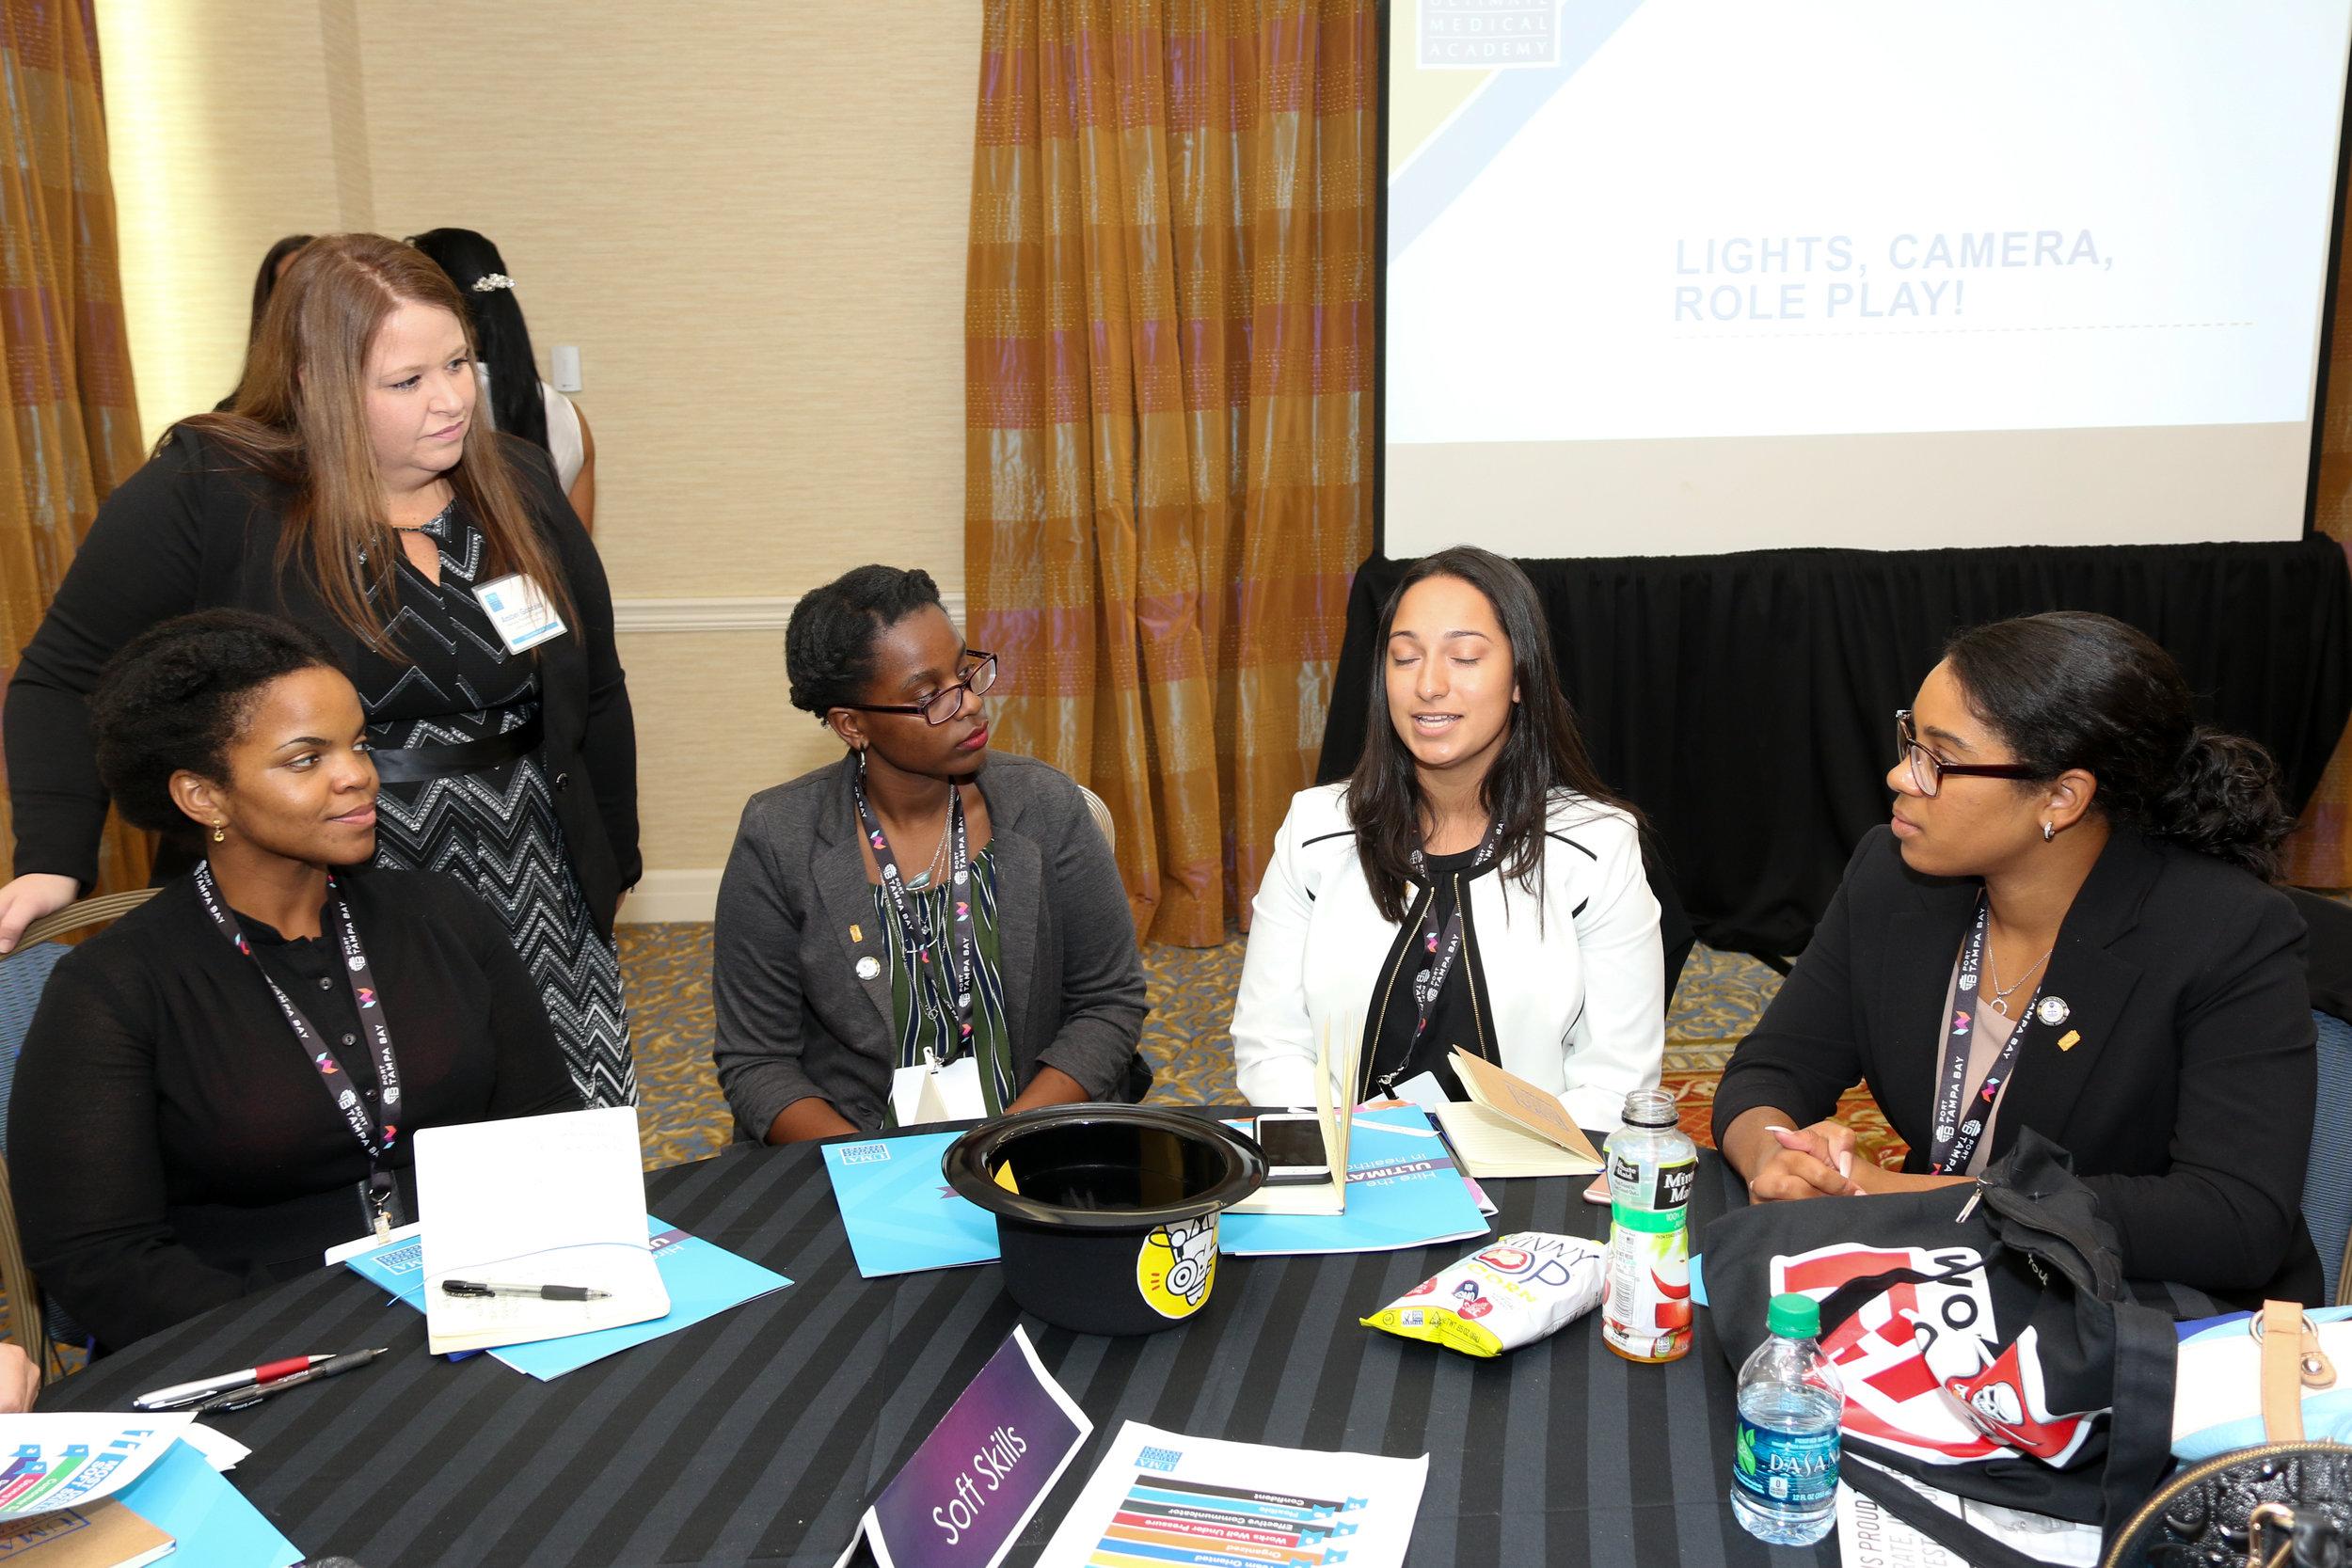 290_WomensConference_10-26-17.jpg